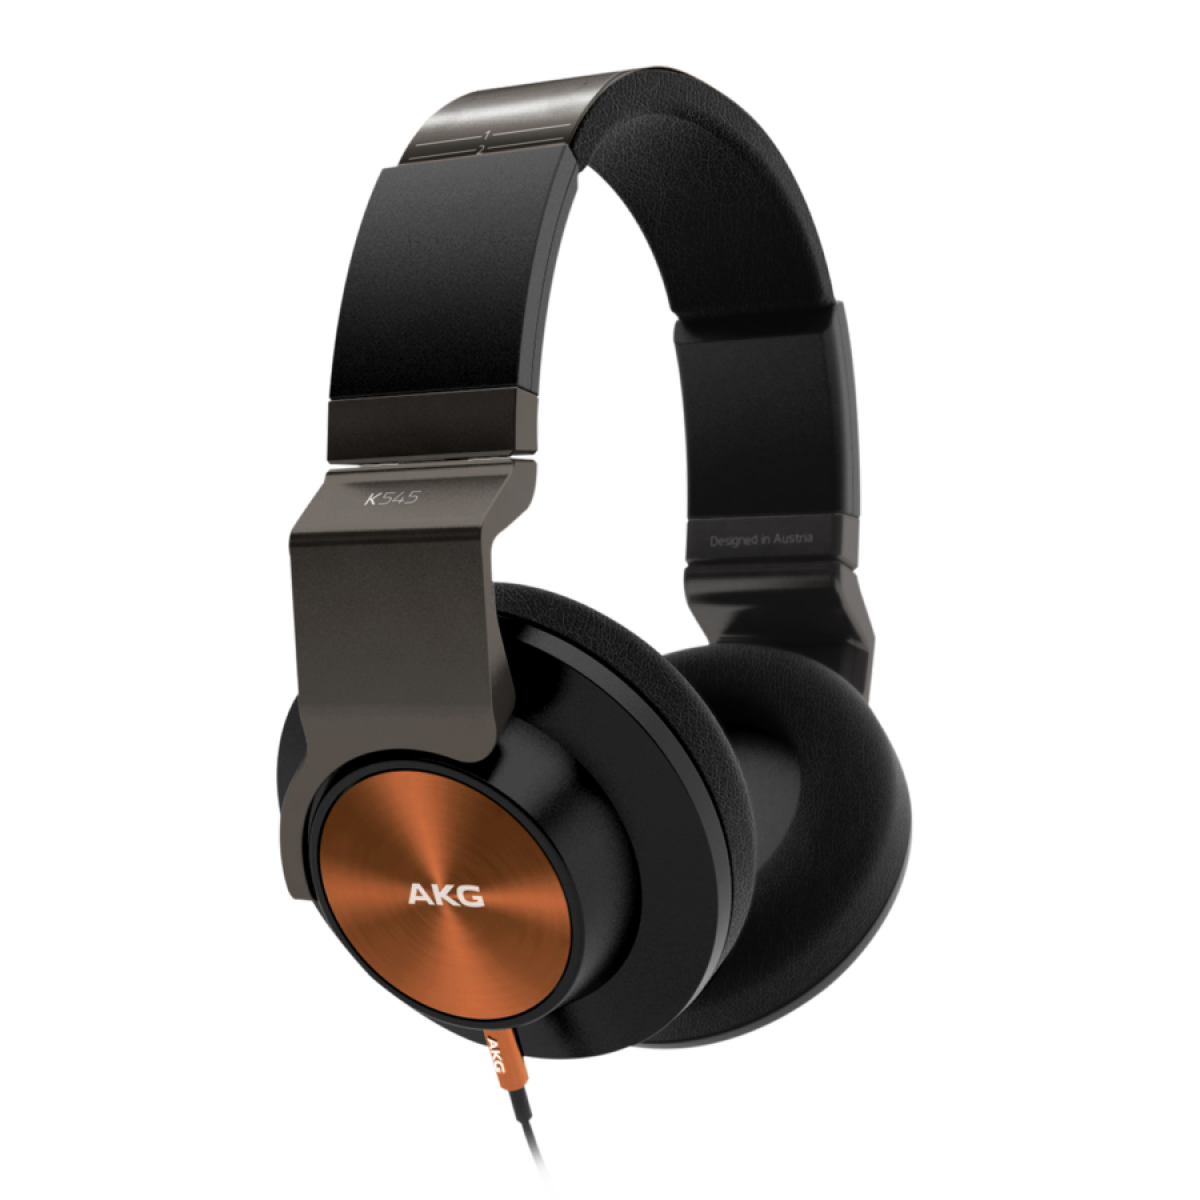 AKG K545 Over ear Headphones Black/Orange